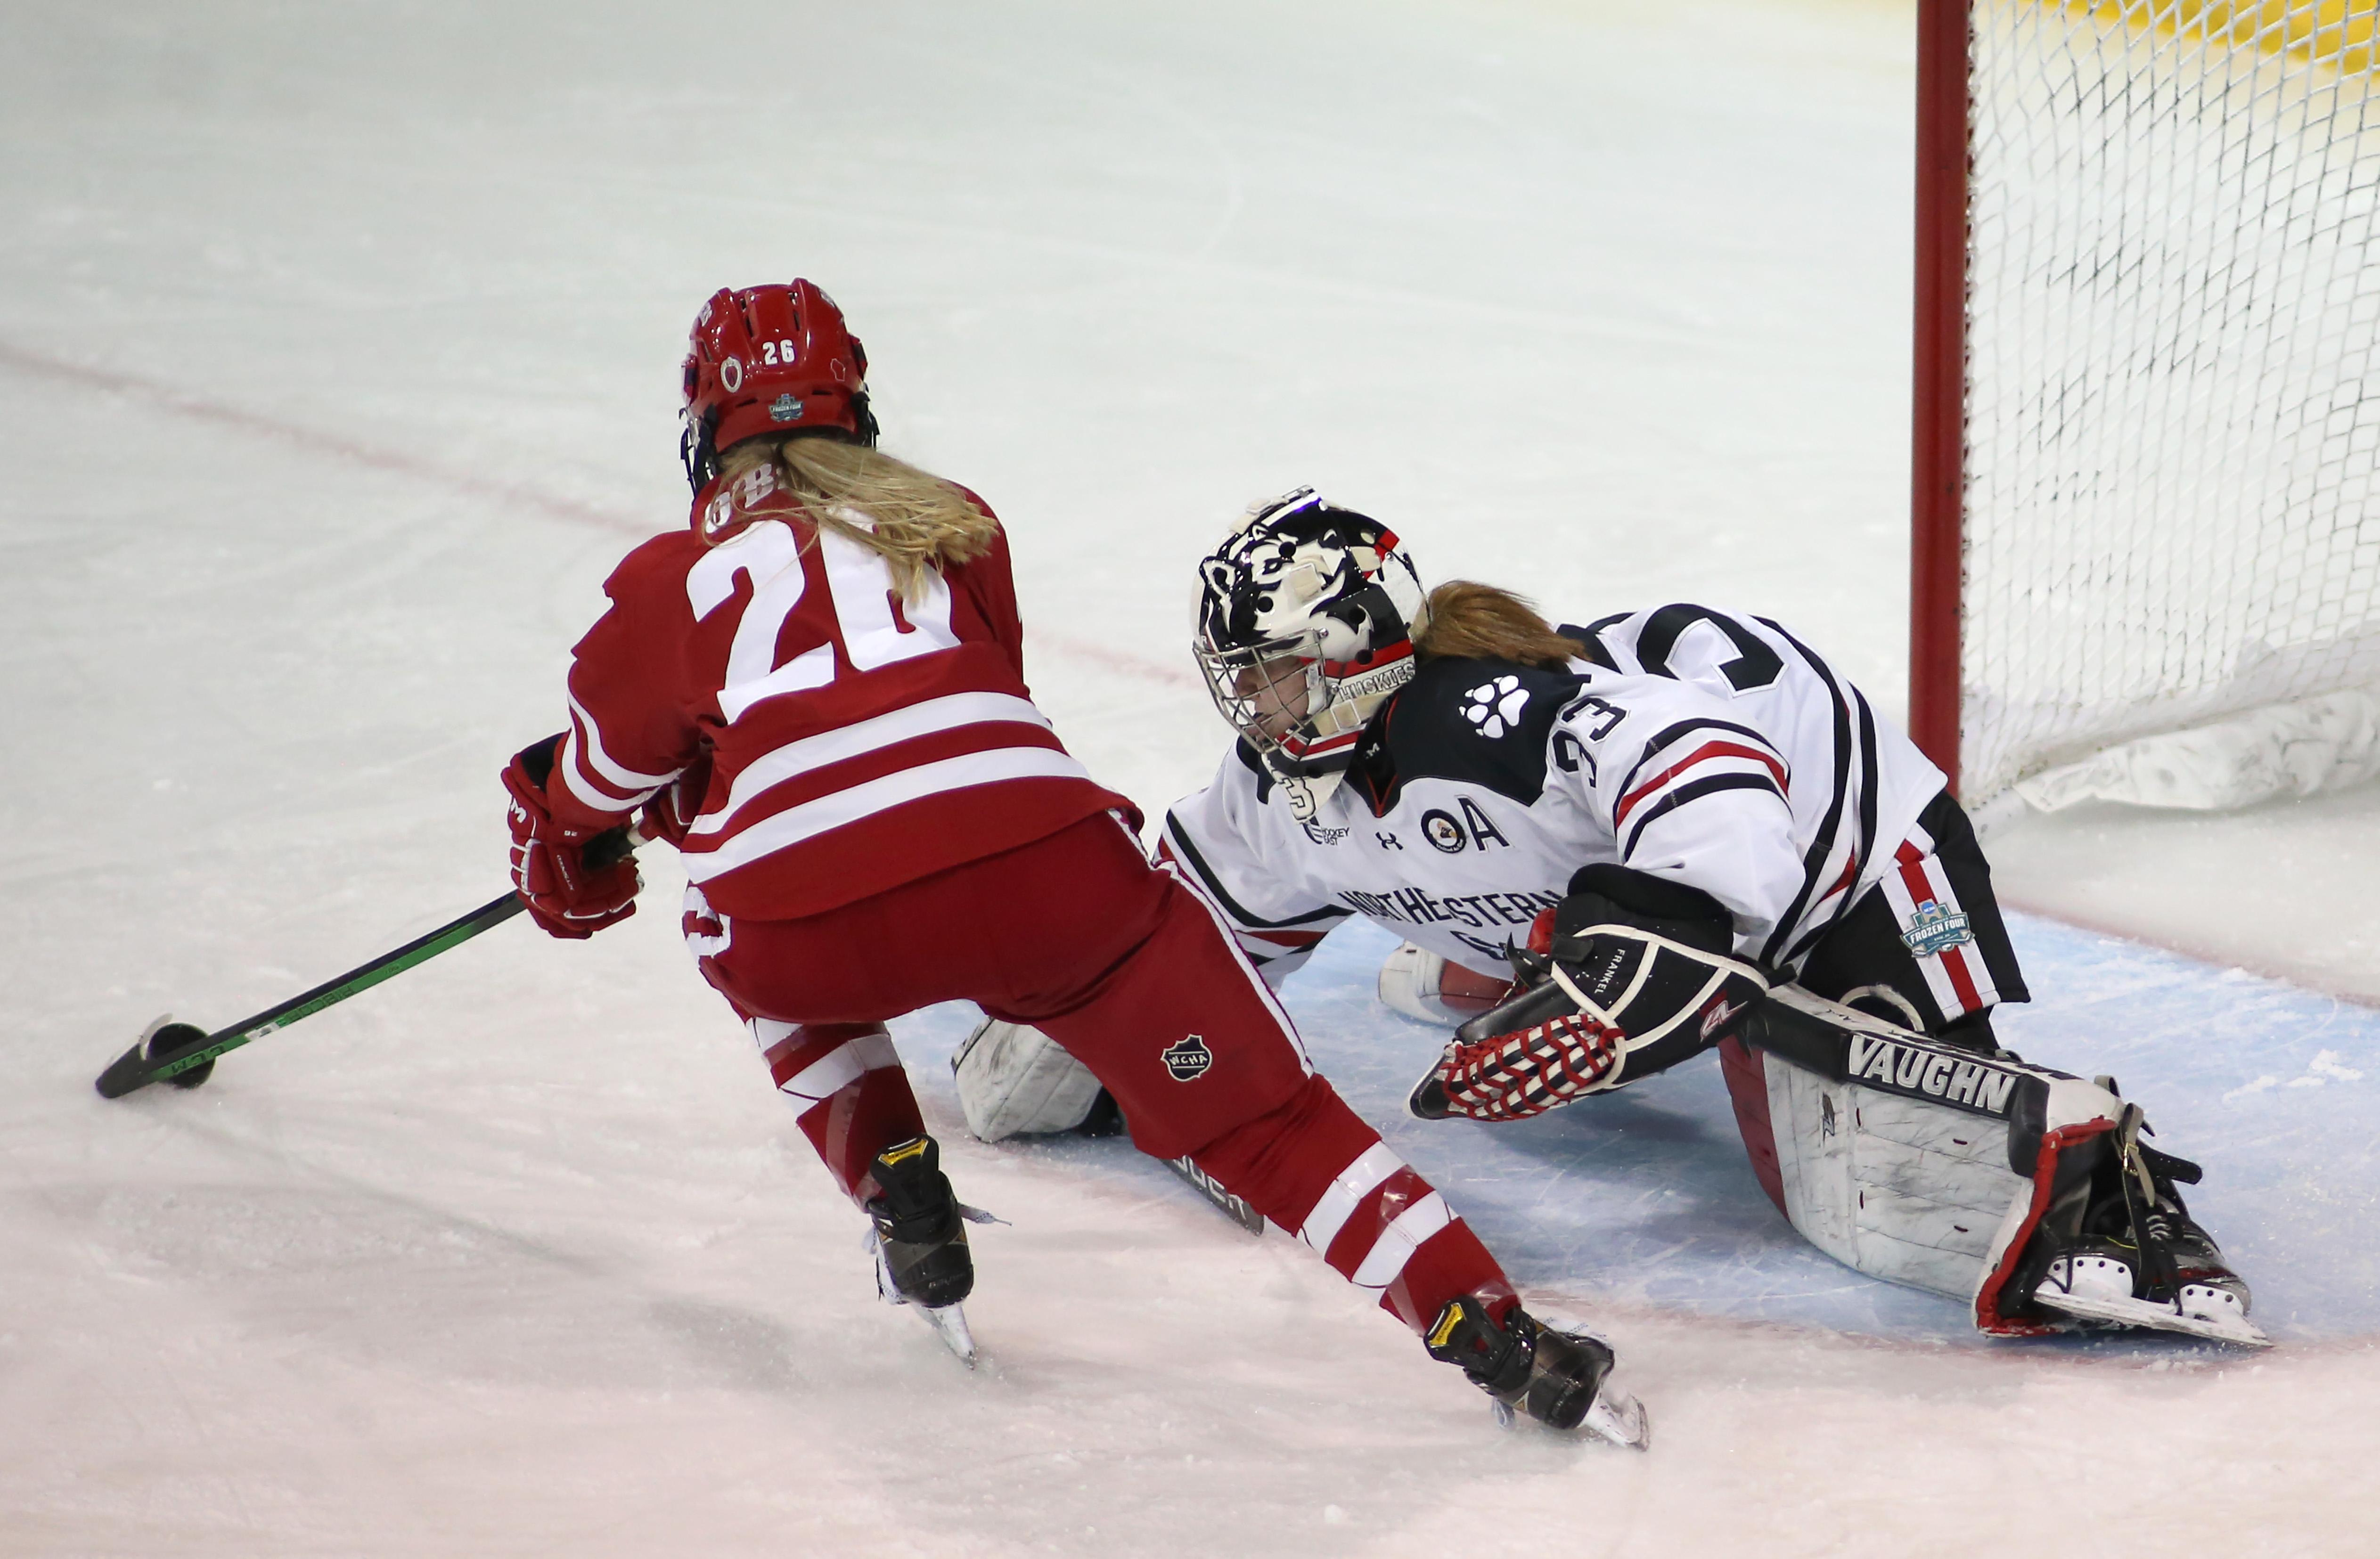 NCAA HOCKEY: MAR 20 Div I Women's Championship - Northeastern v Wisconsin